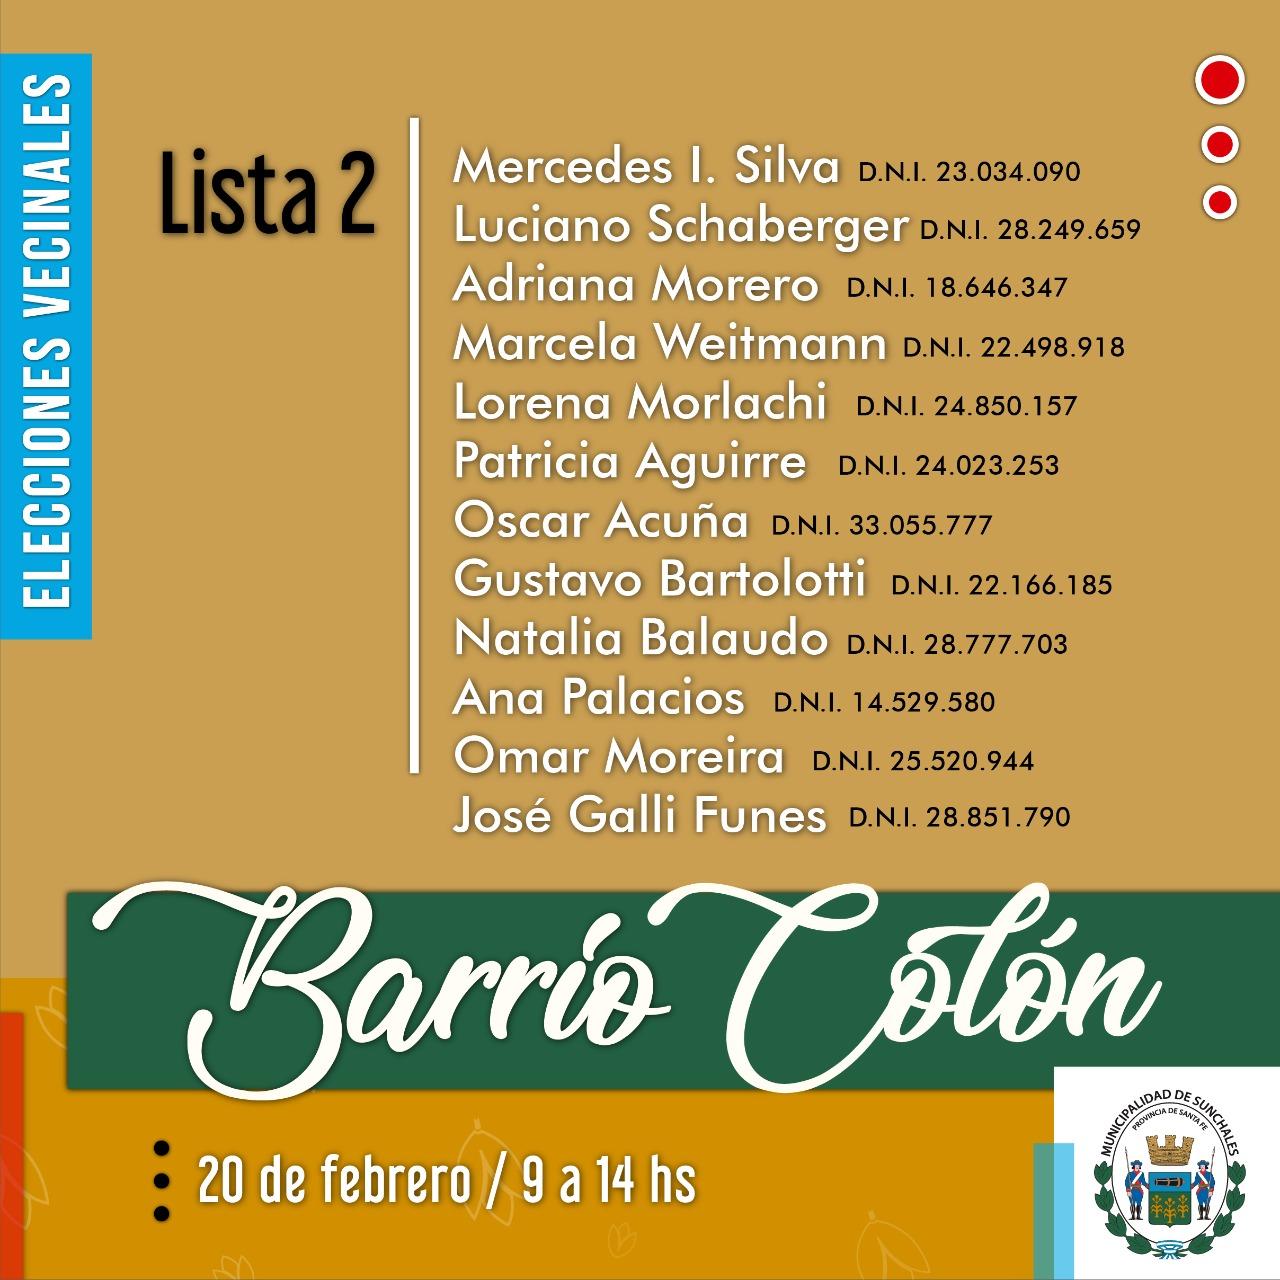 Lista 2 Colón